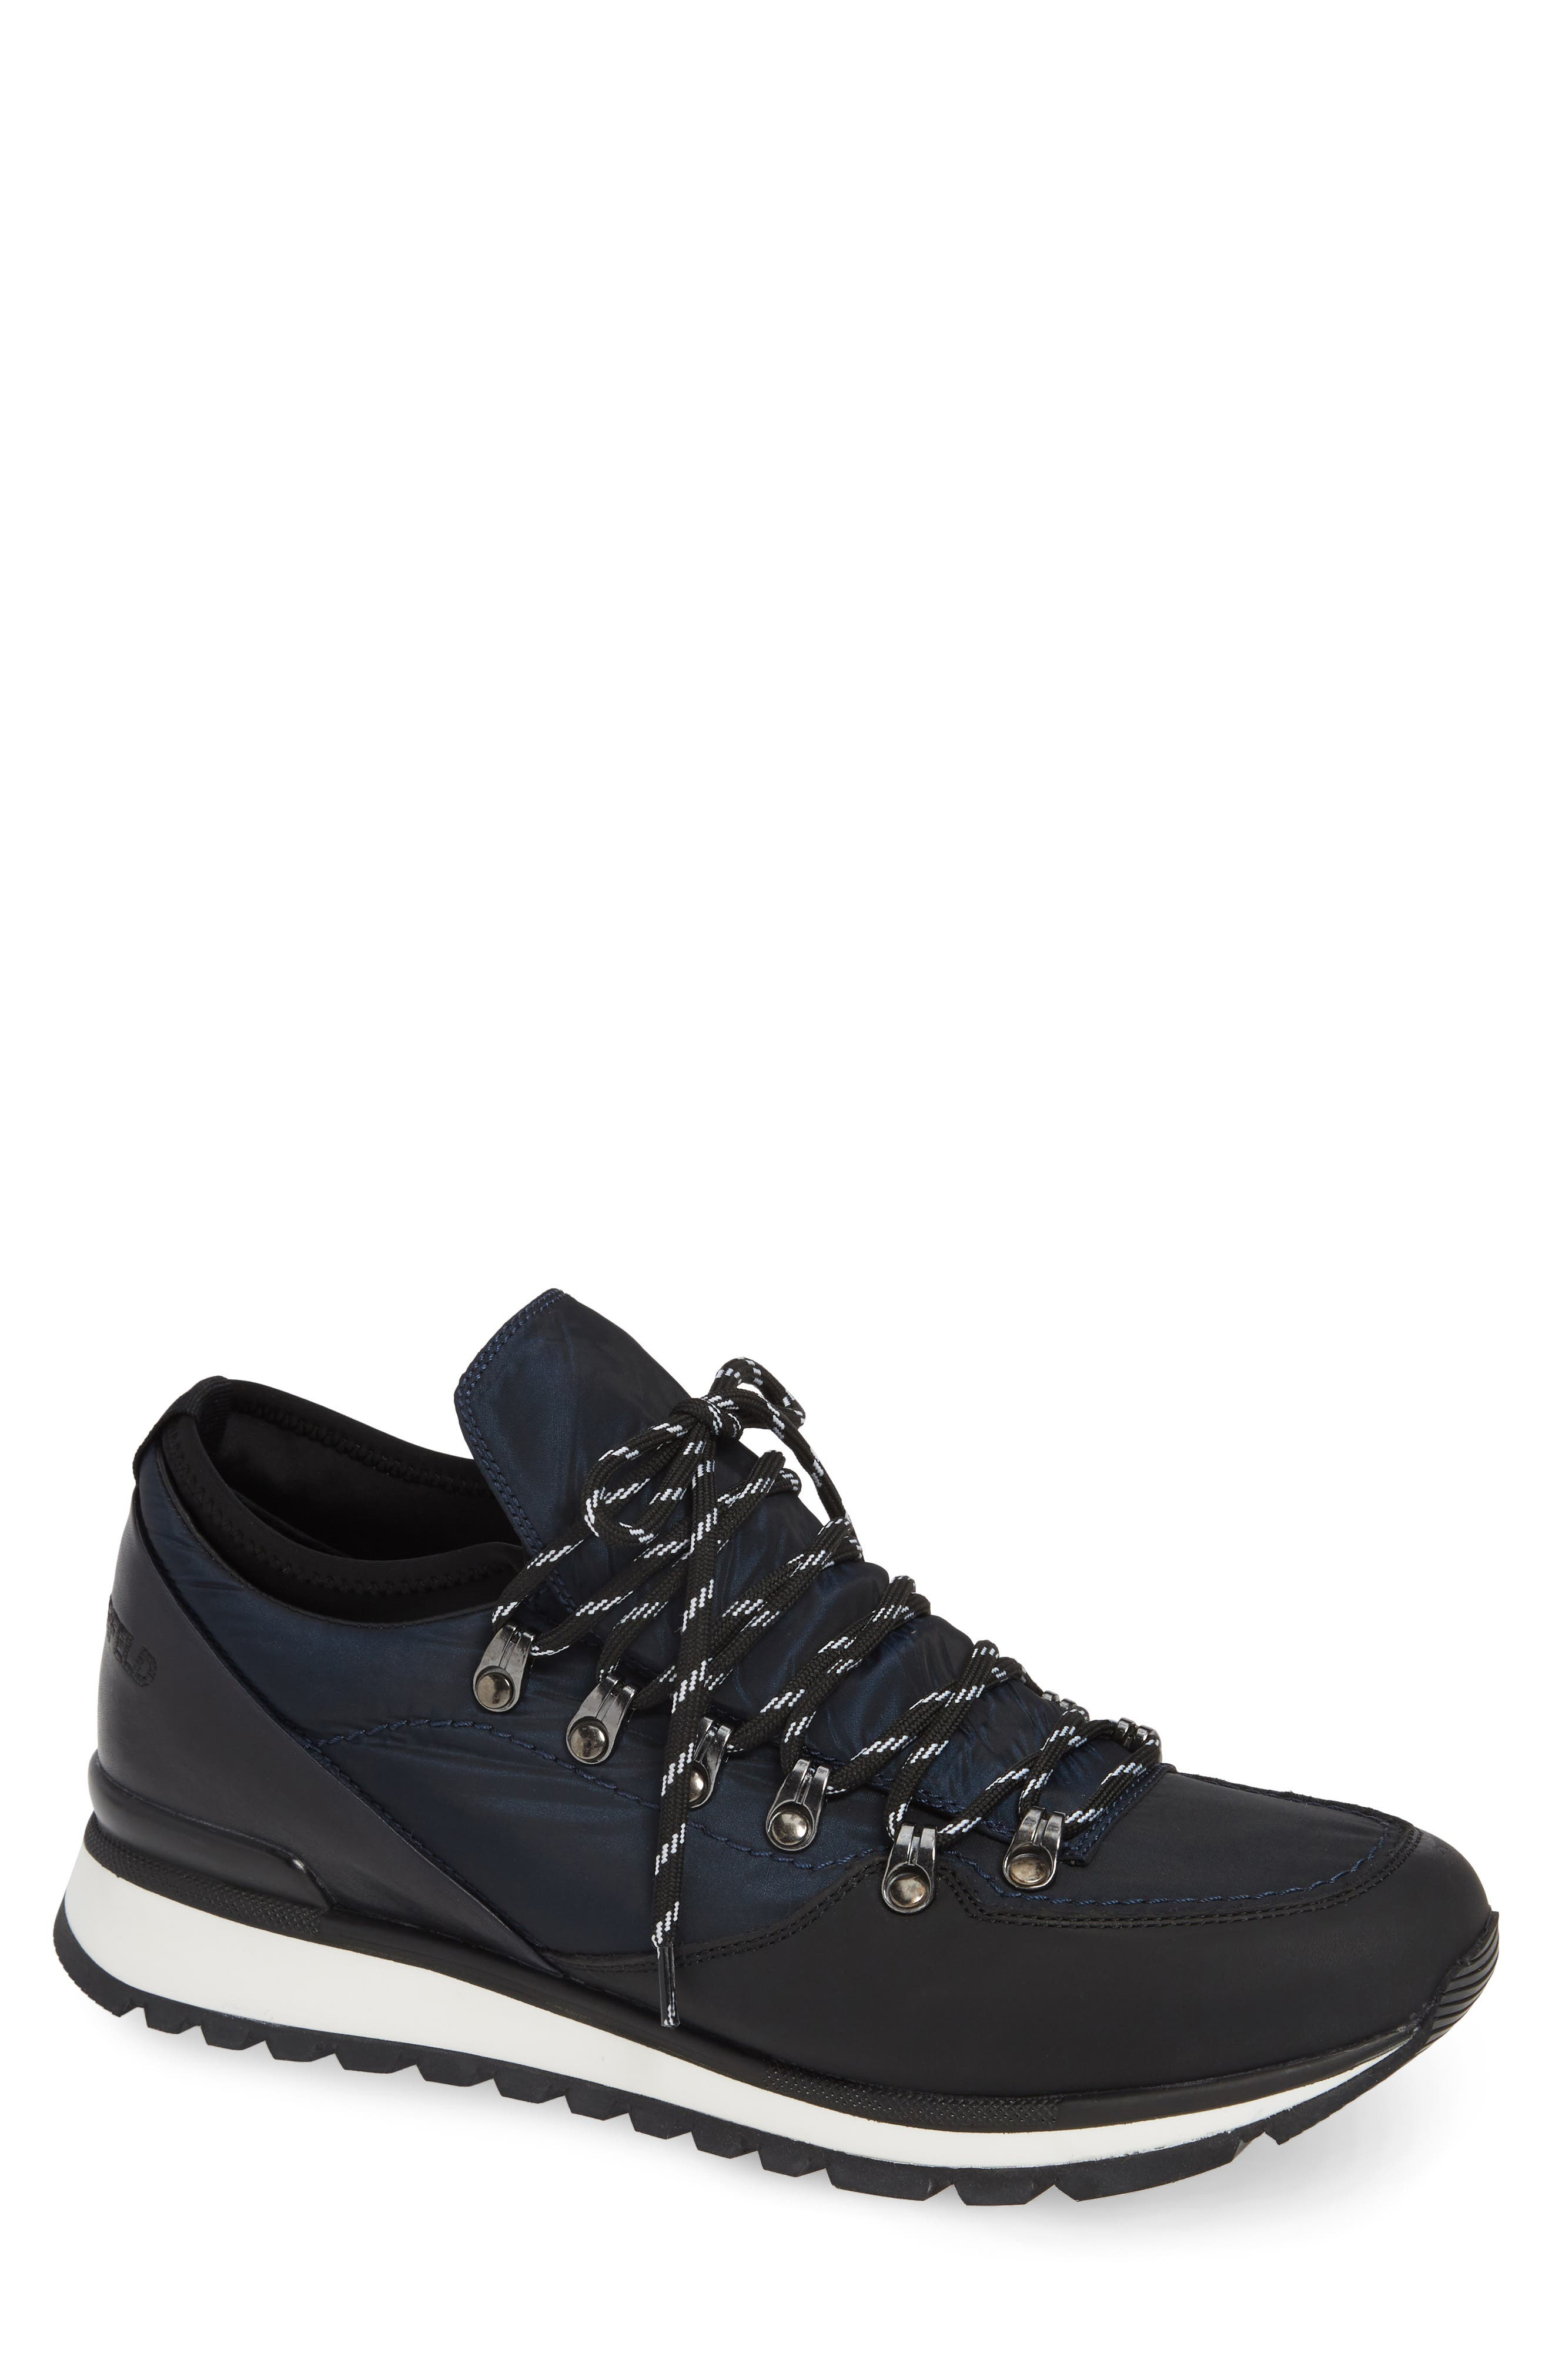 Low Top Hiker Sneaker,                             Main thumbnail 1, color,                             NAVY